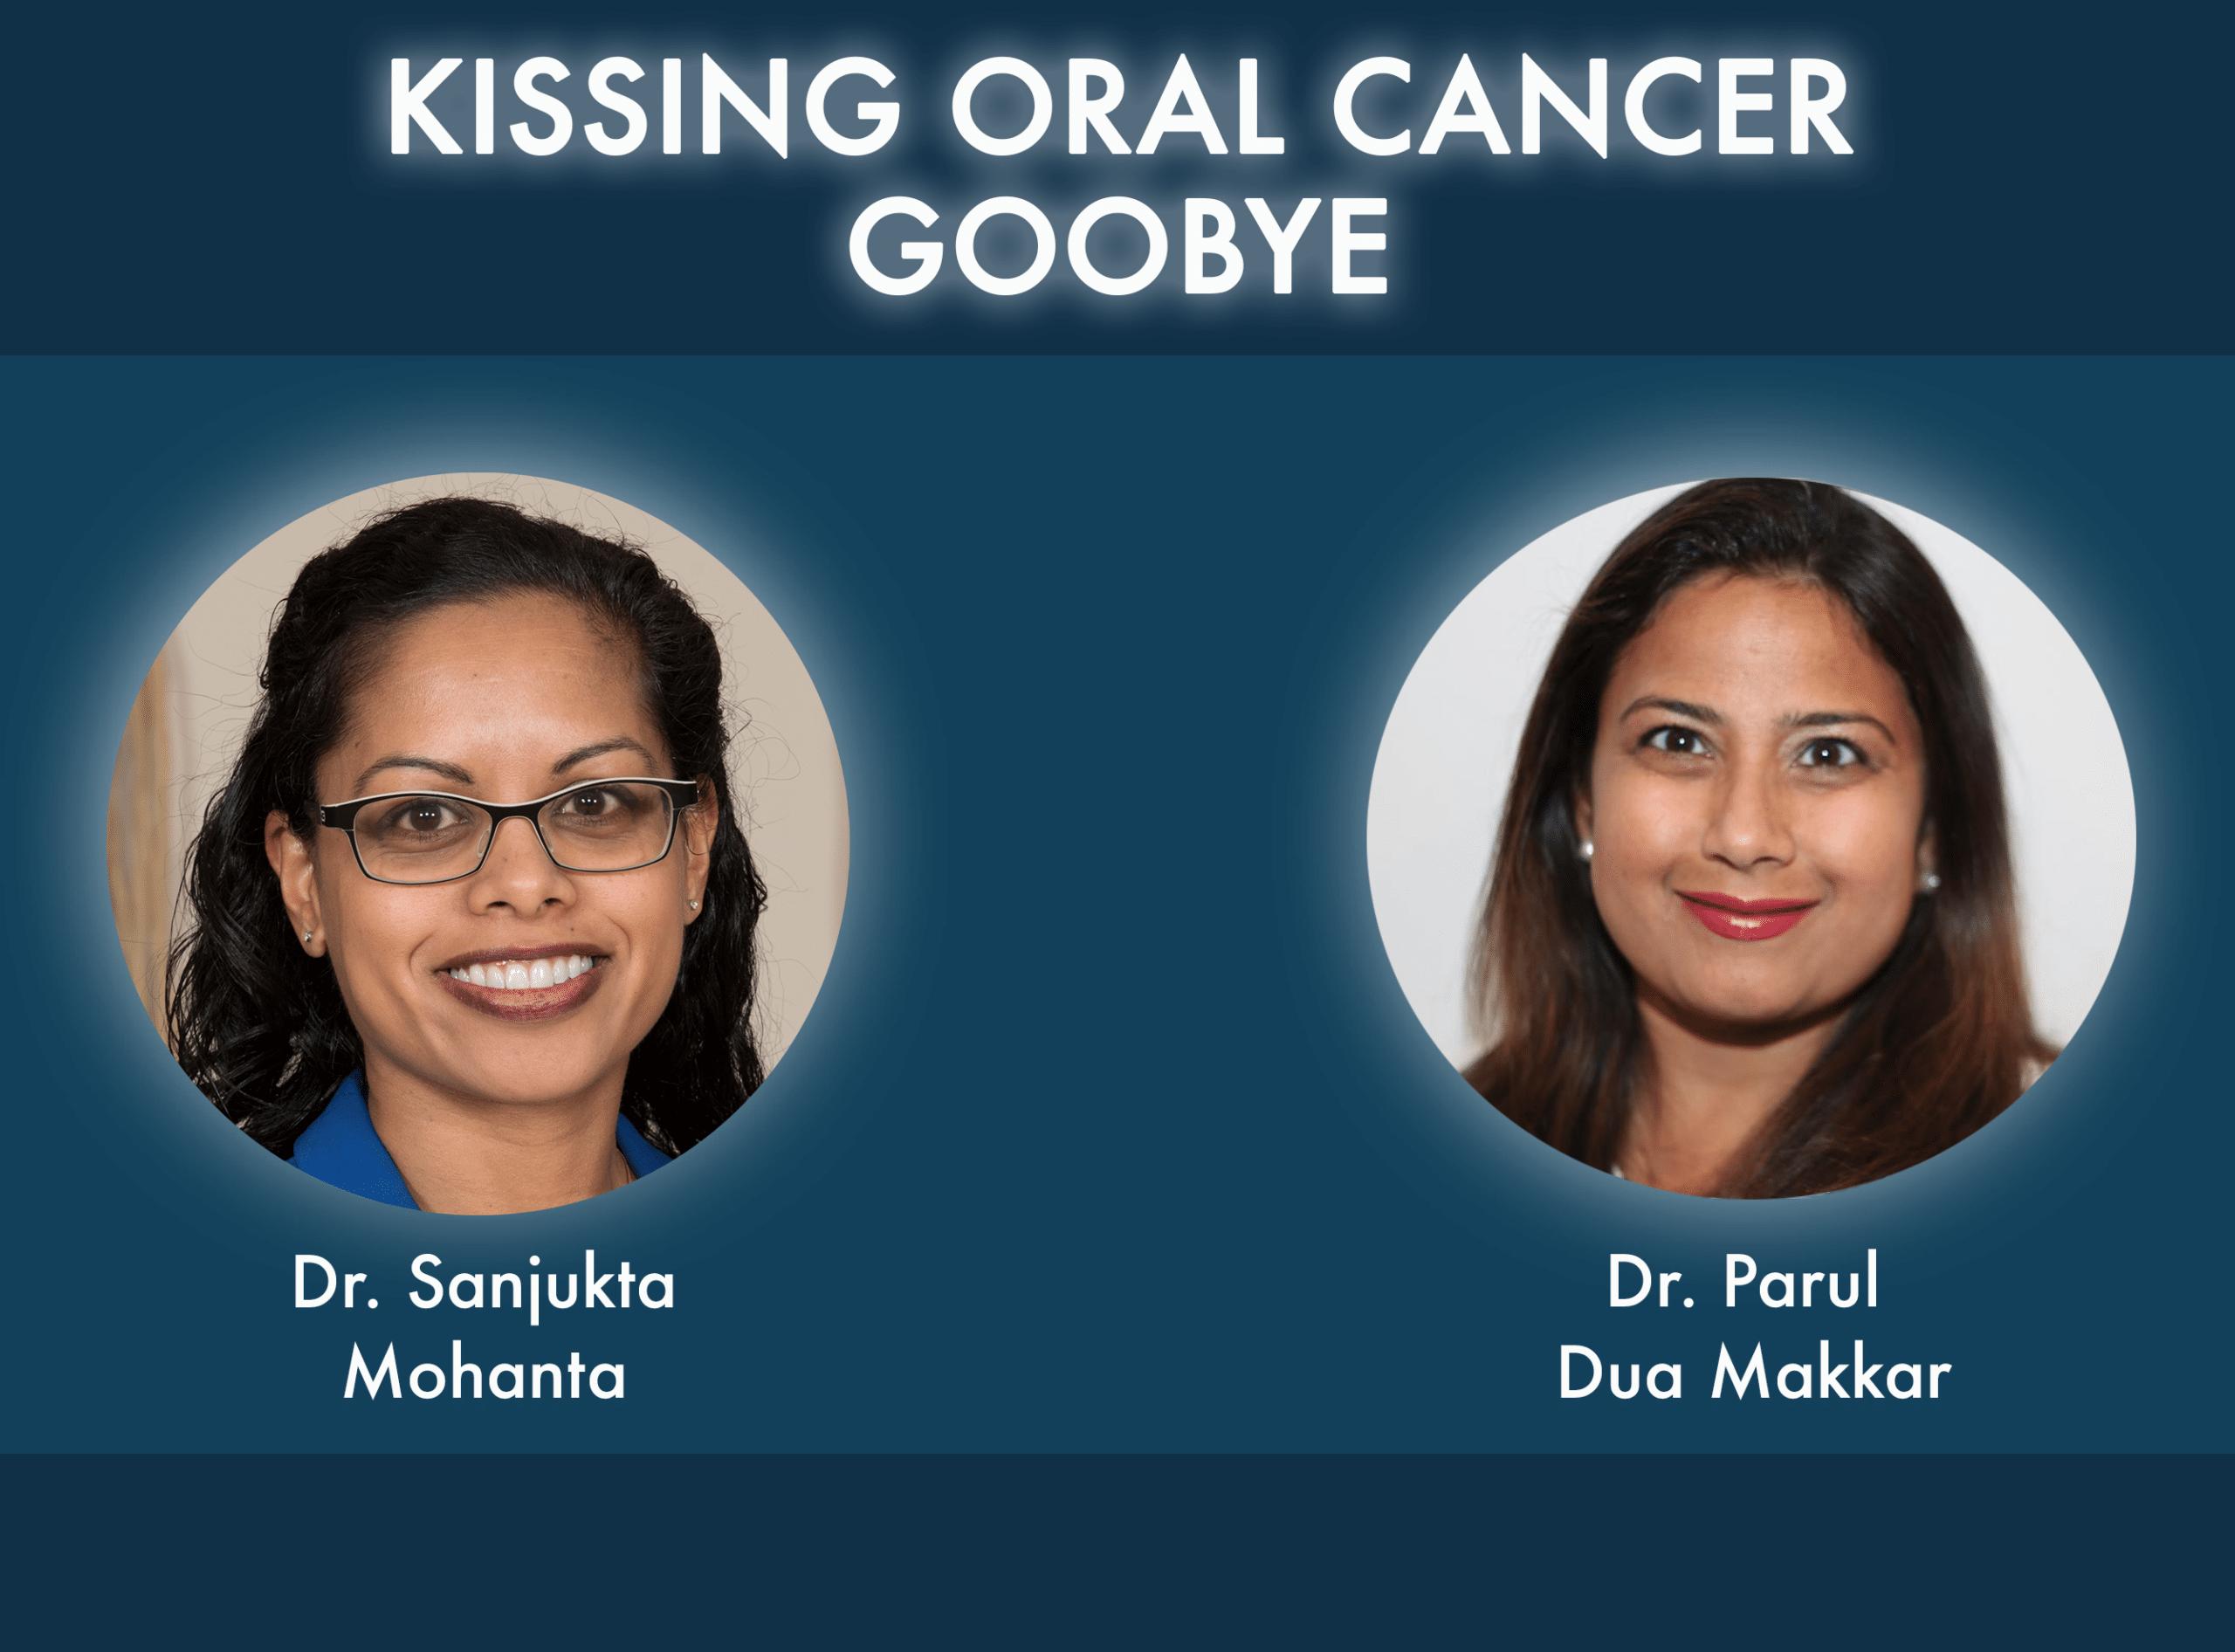 Kissing Oral Cancer Goodbye